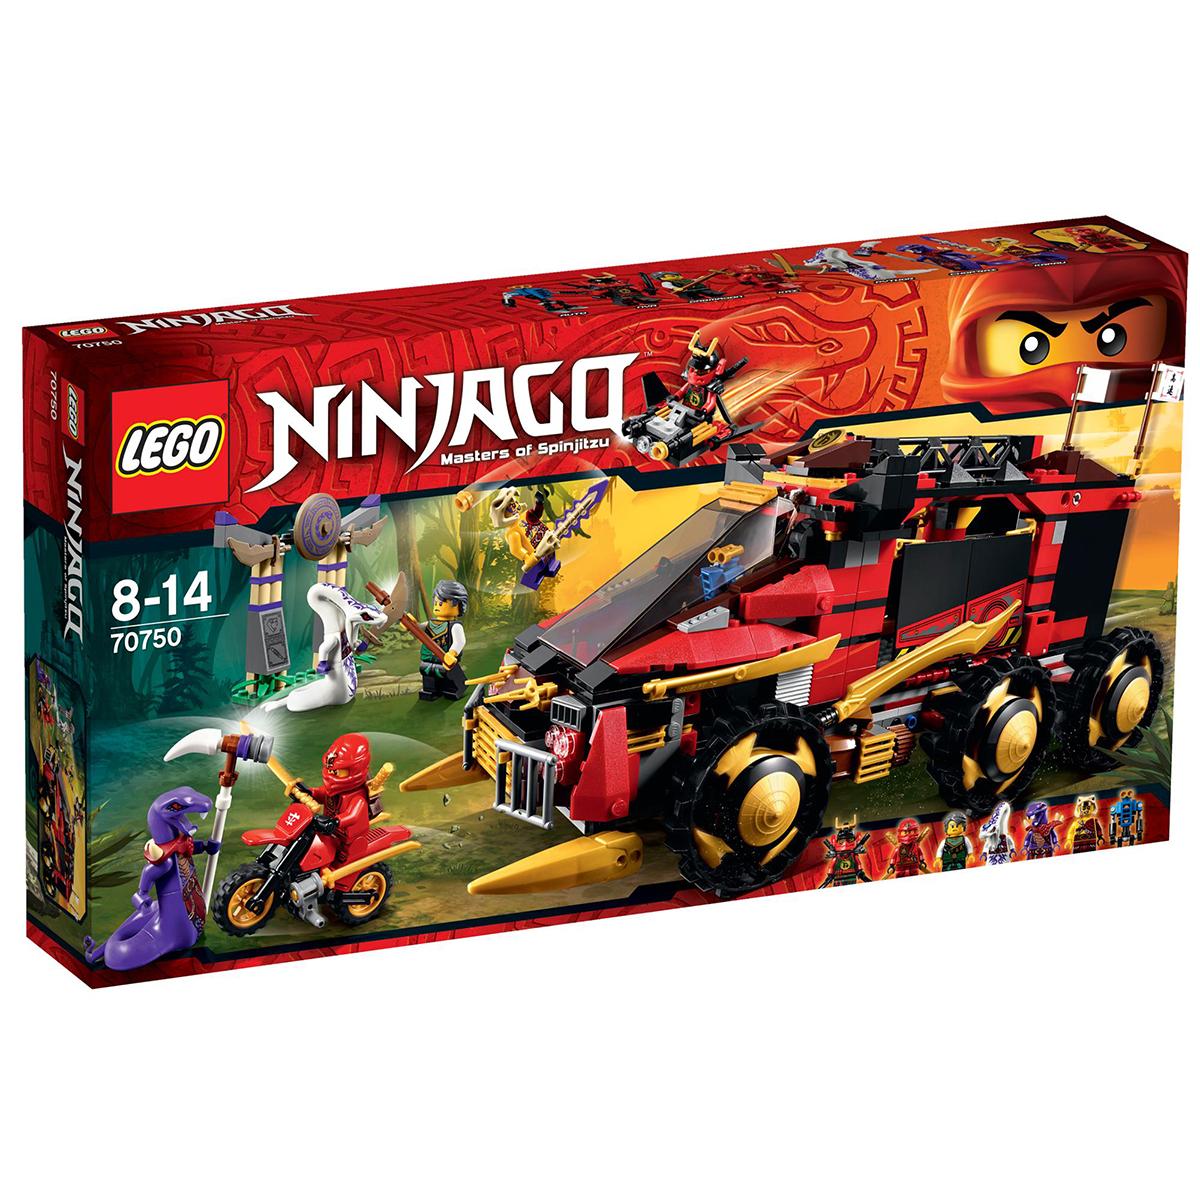 Lego Ninjago 70750 – Xe chien dau Ninja DBX